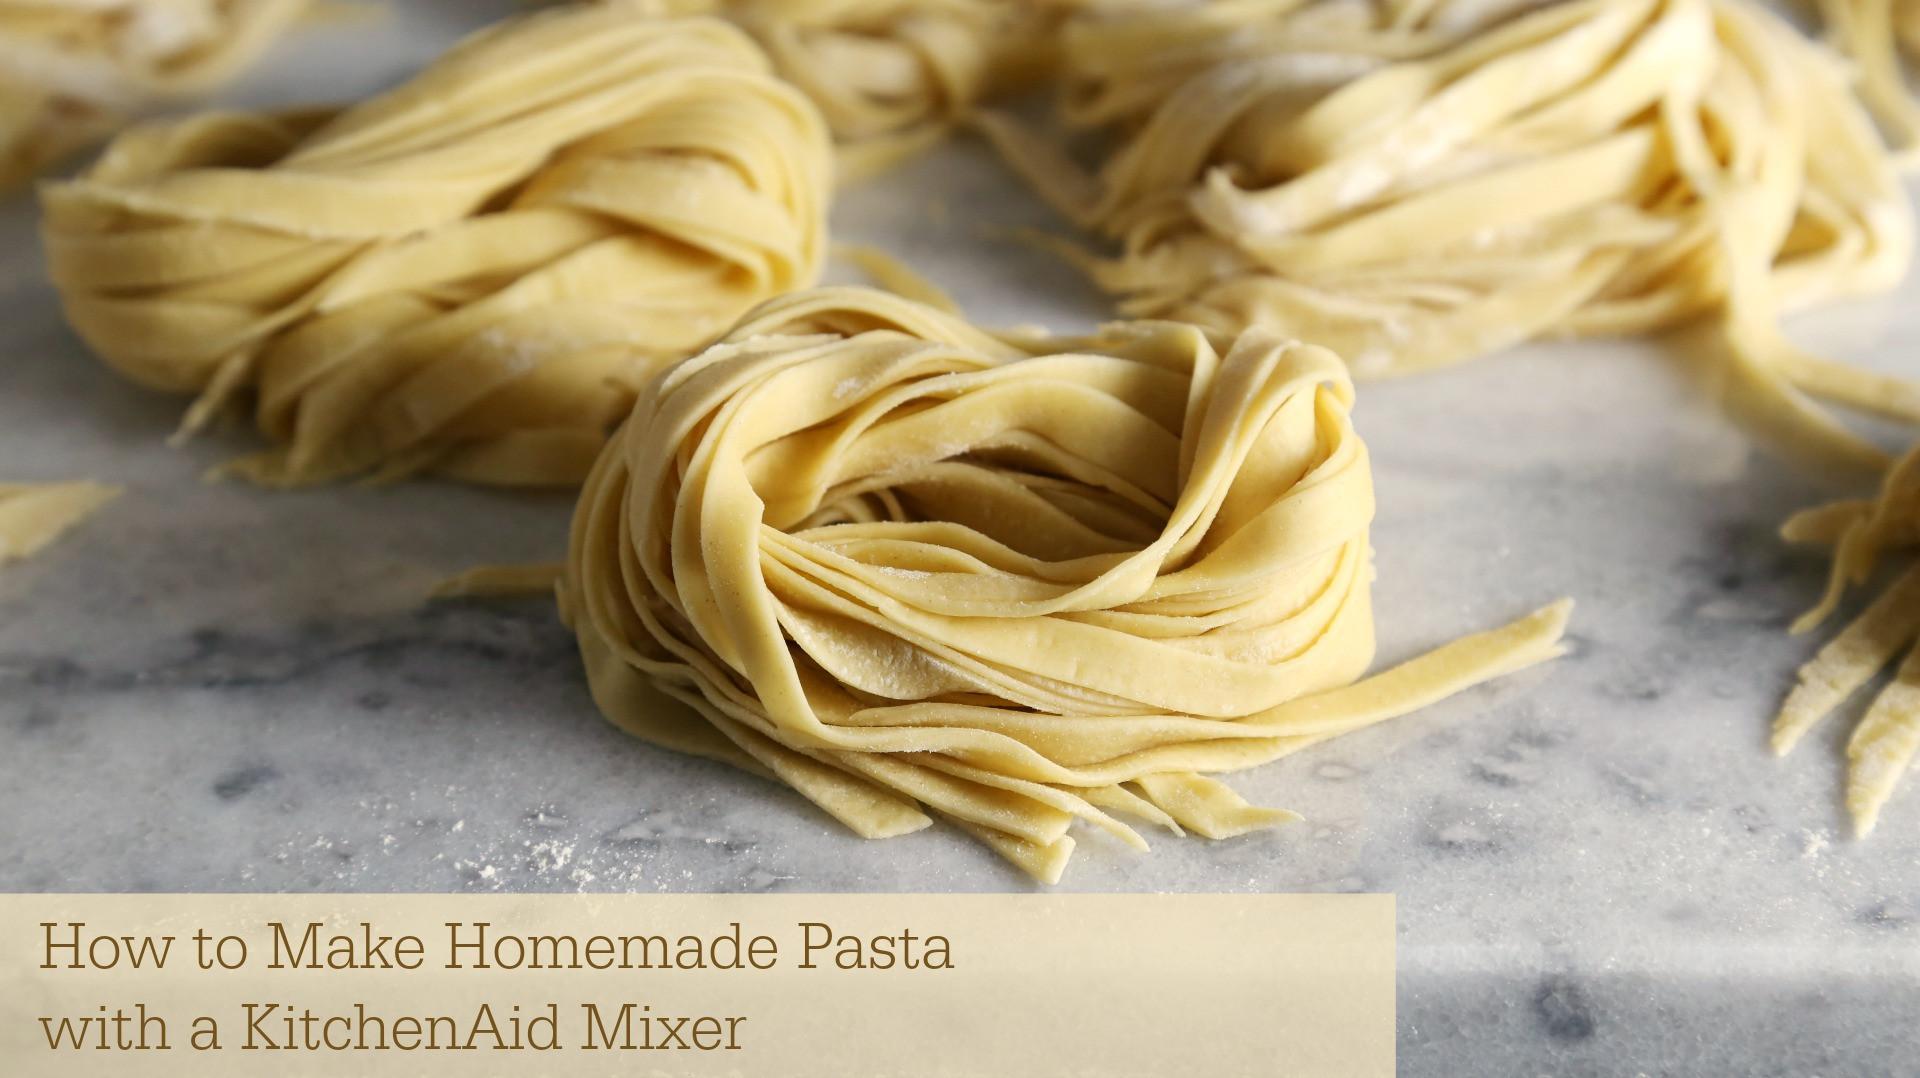 How To Make Homemade Pasta  How to Make Homemade Pasta with KitchenAid Mixer Sober Julie